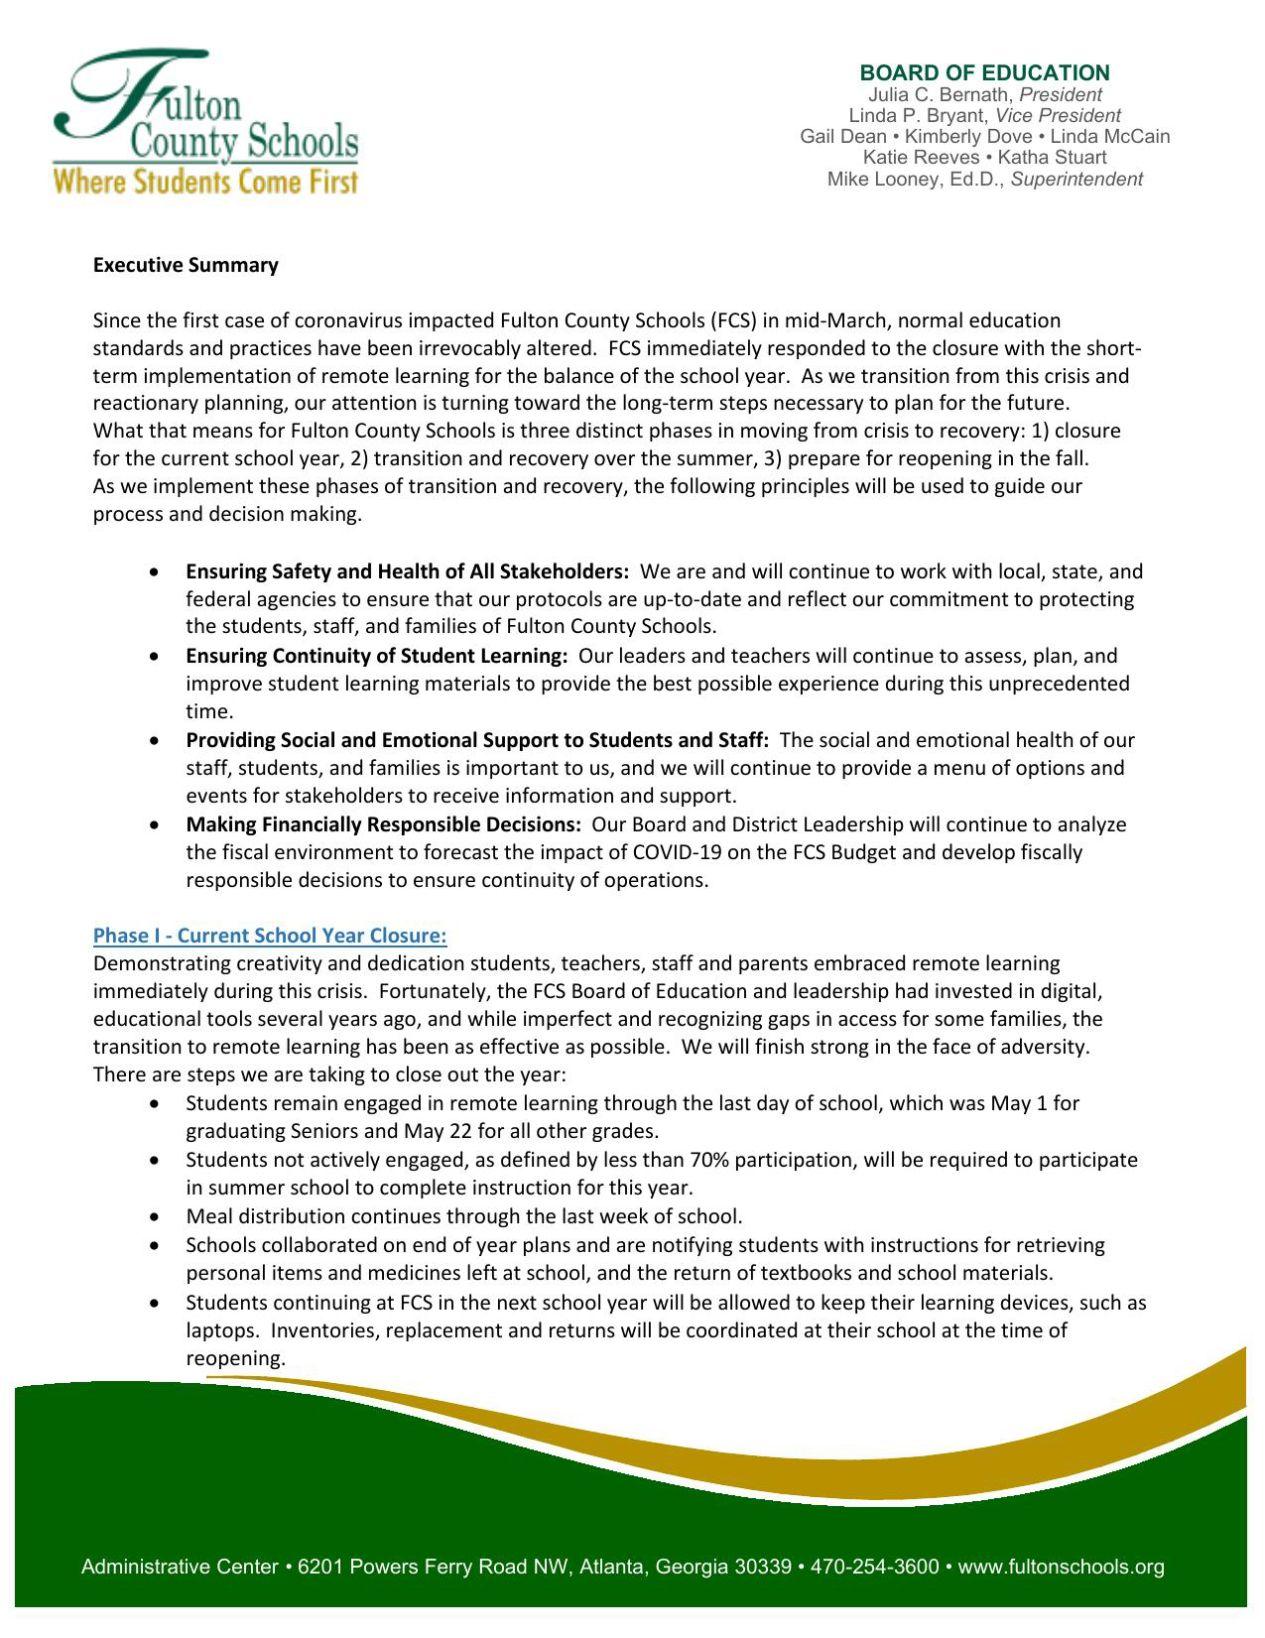 Fulton County Board of Education executive summary